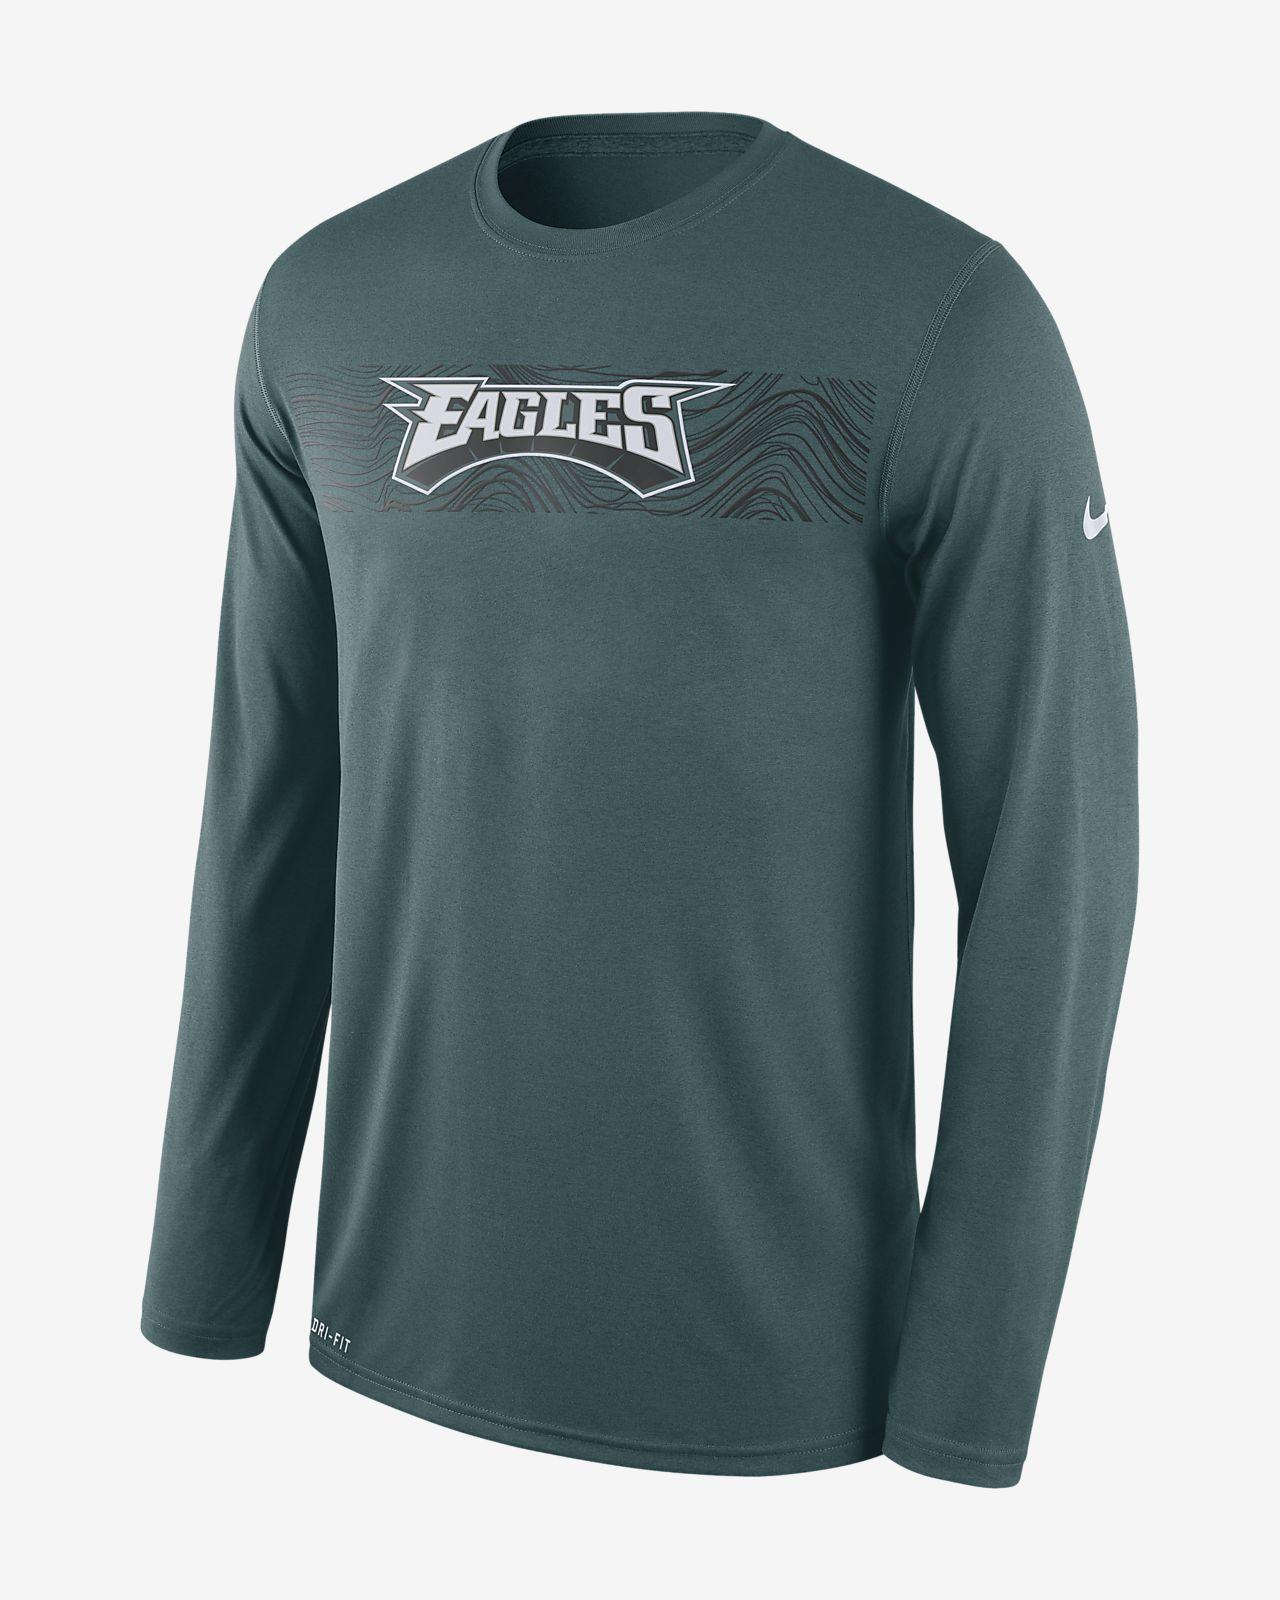 797680bee Nike Dri-FIT Legend Seismic (NFL Eagles) Men s Long Sleeve T-Shirt ...